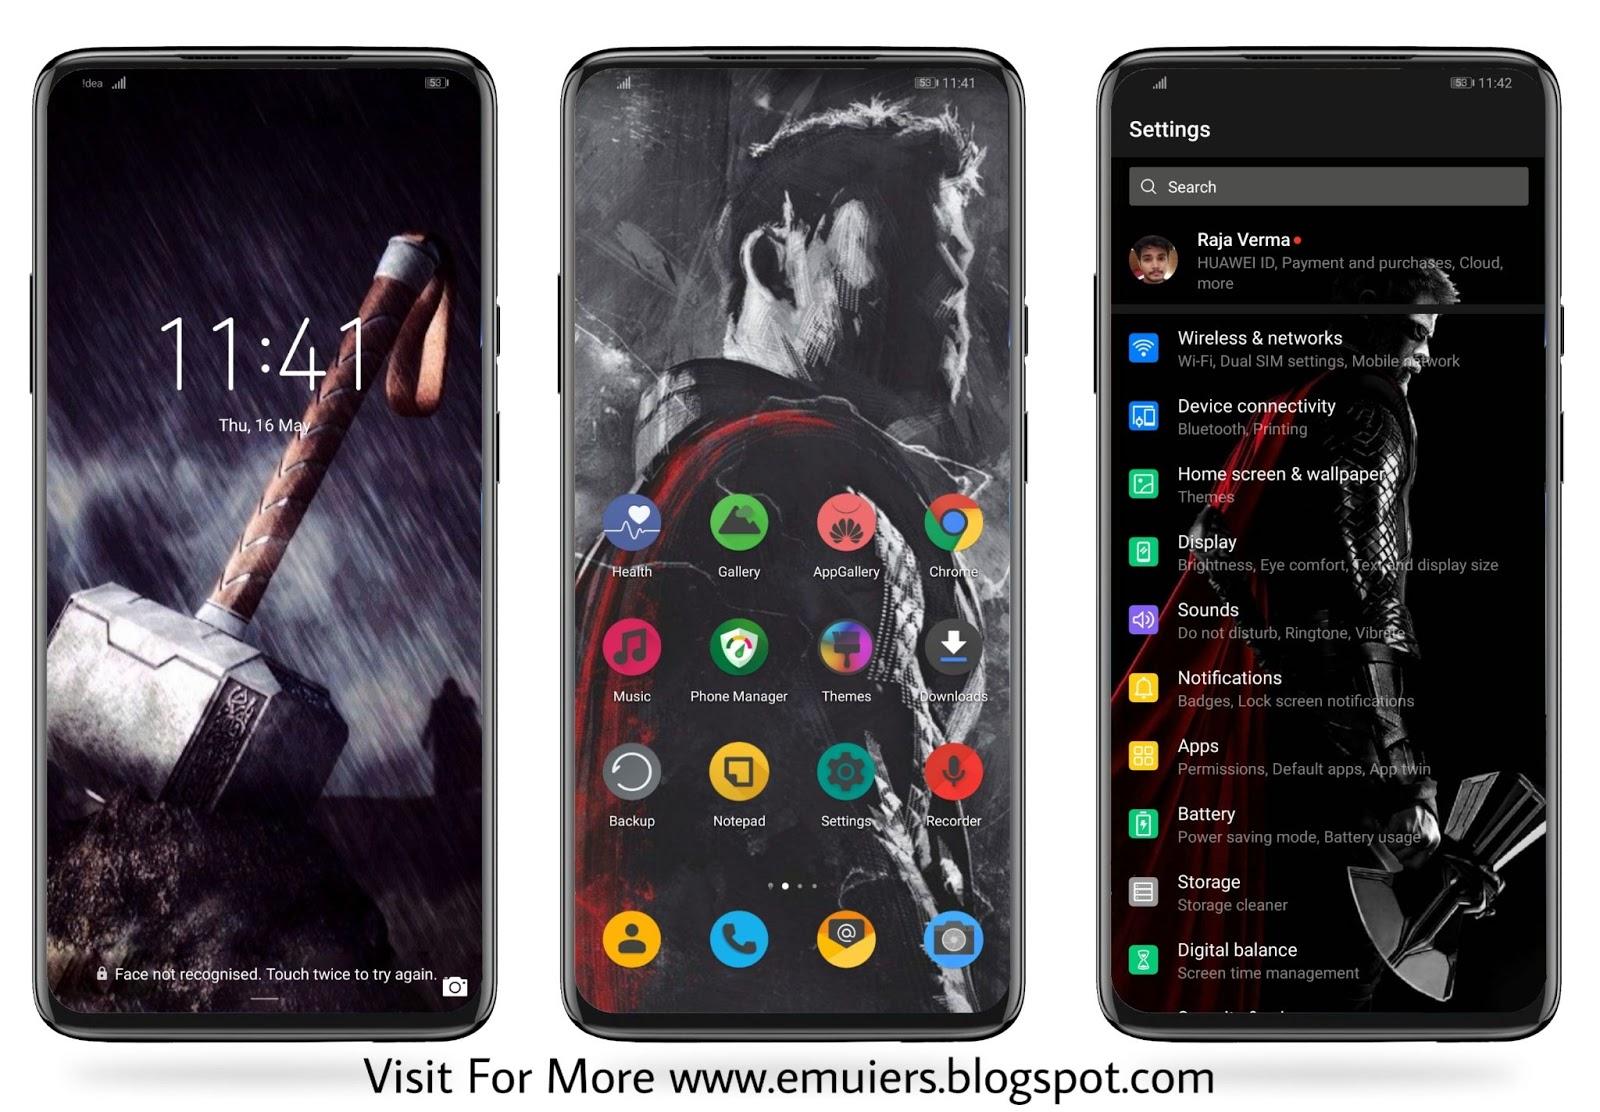 Thor EMUI Theme Download For Huawei & HONOR Phones || EMUI